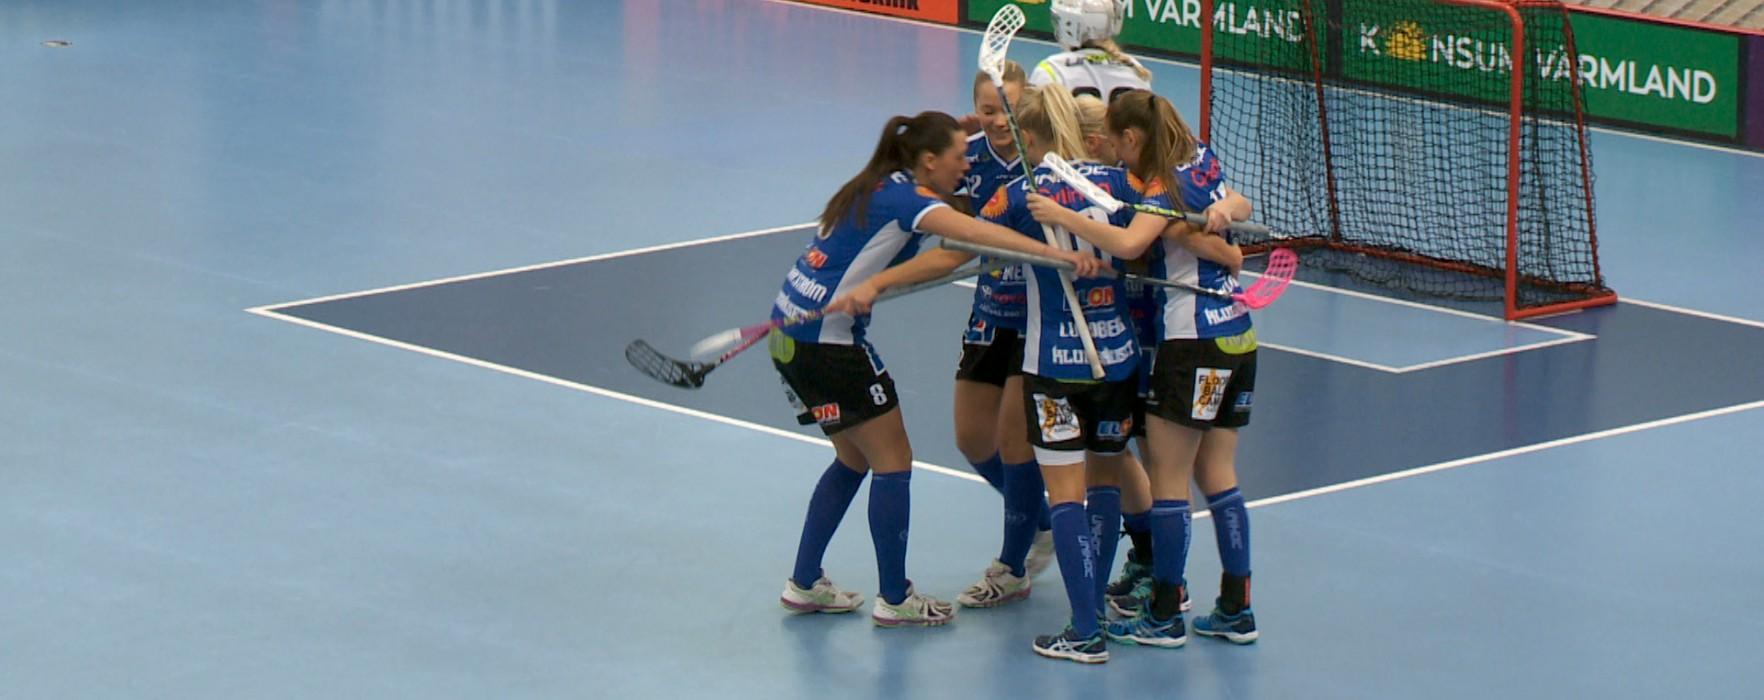 Glimt Sport, SSL Dam Sammandrag Karlstad IBF – IBK Dalen